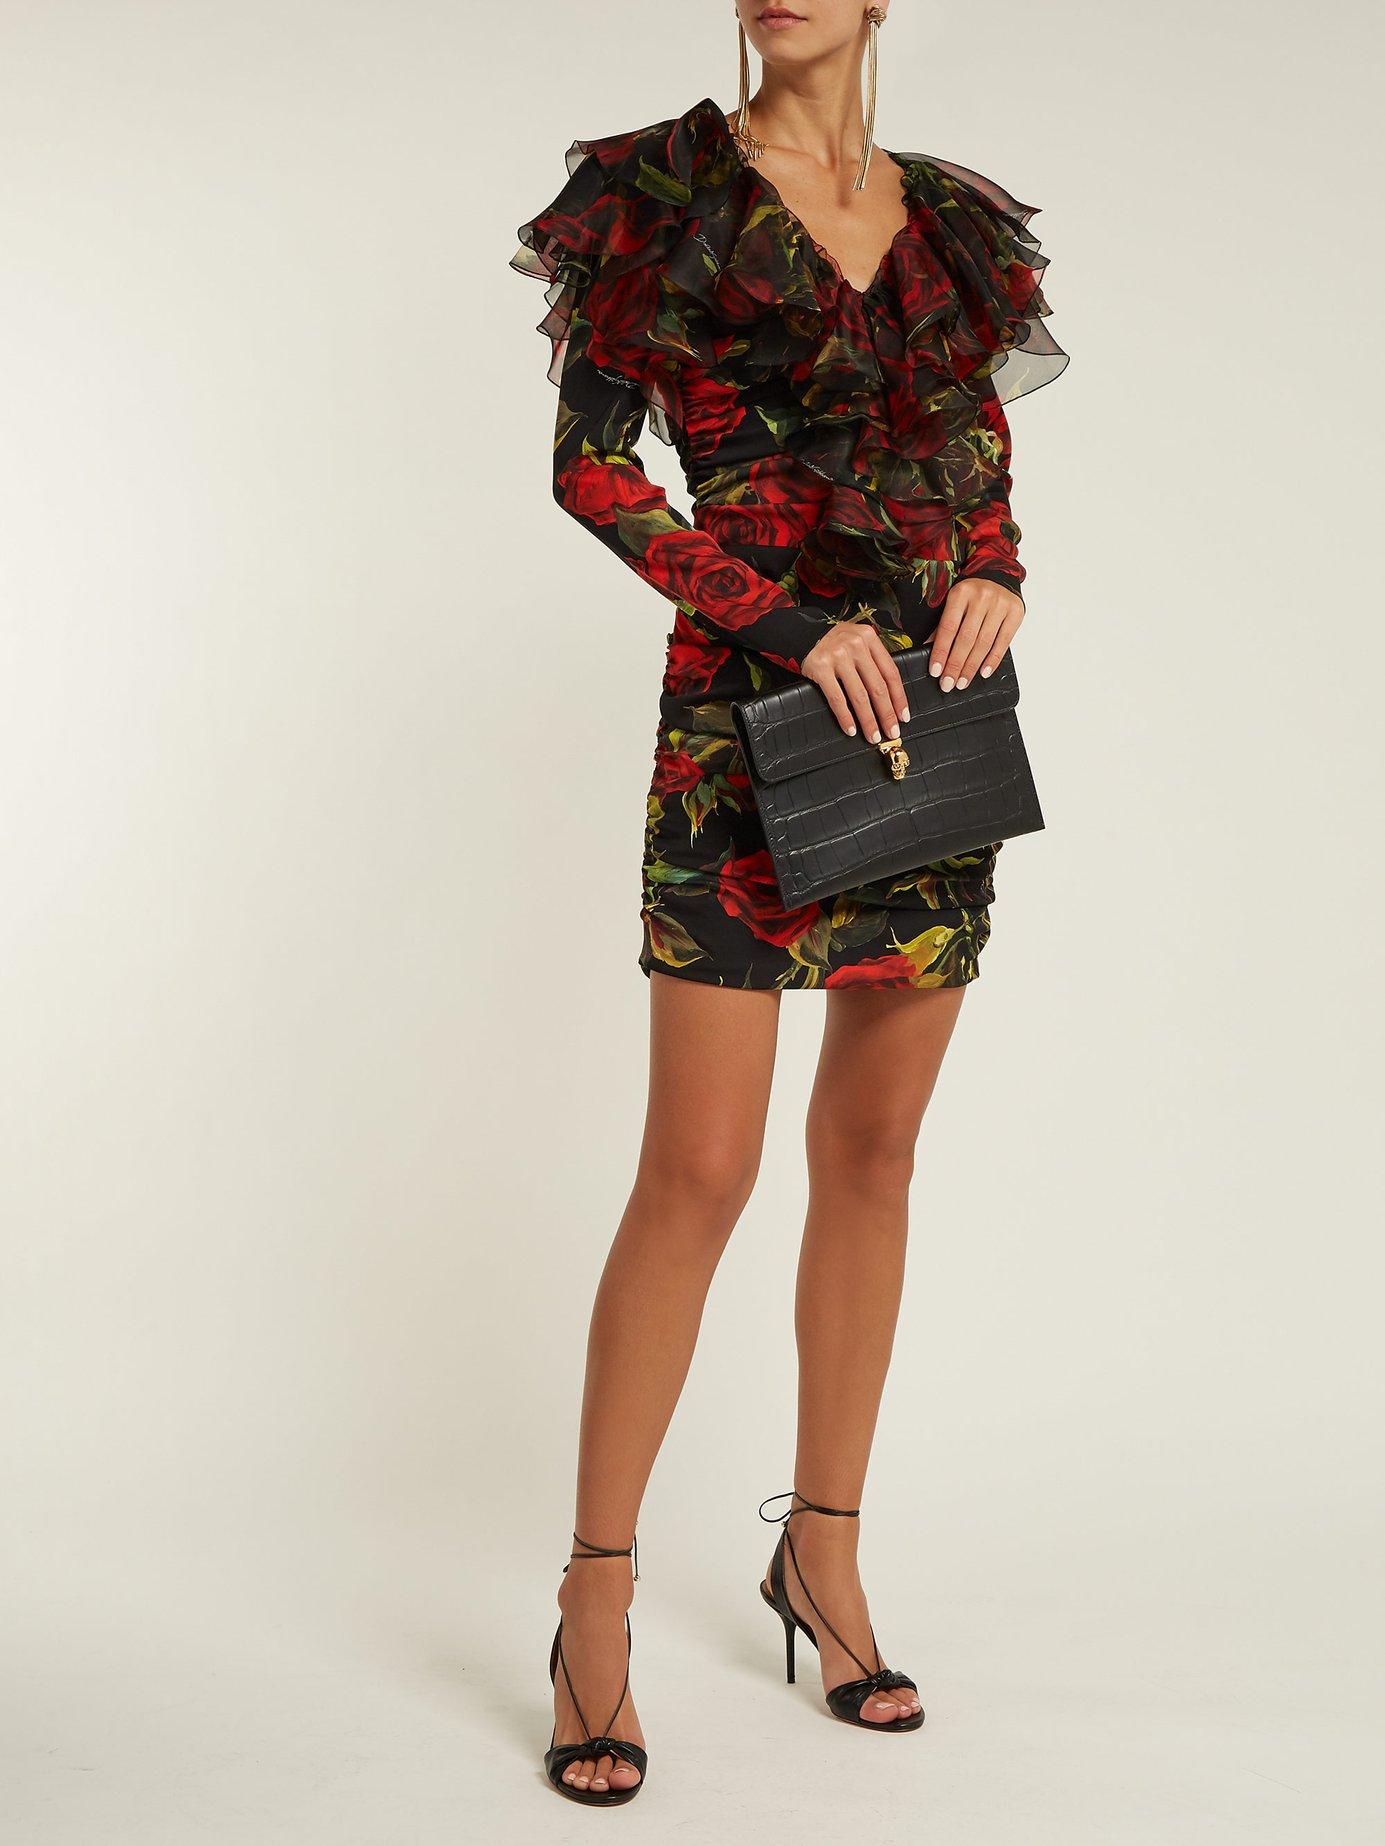 Roses-print ruched mini dress by Dolce & Gabbana